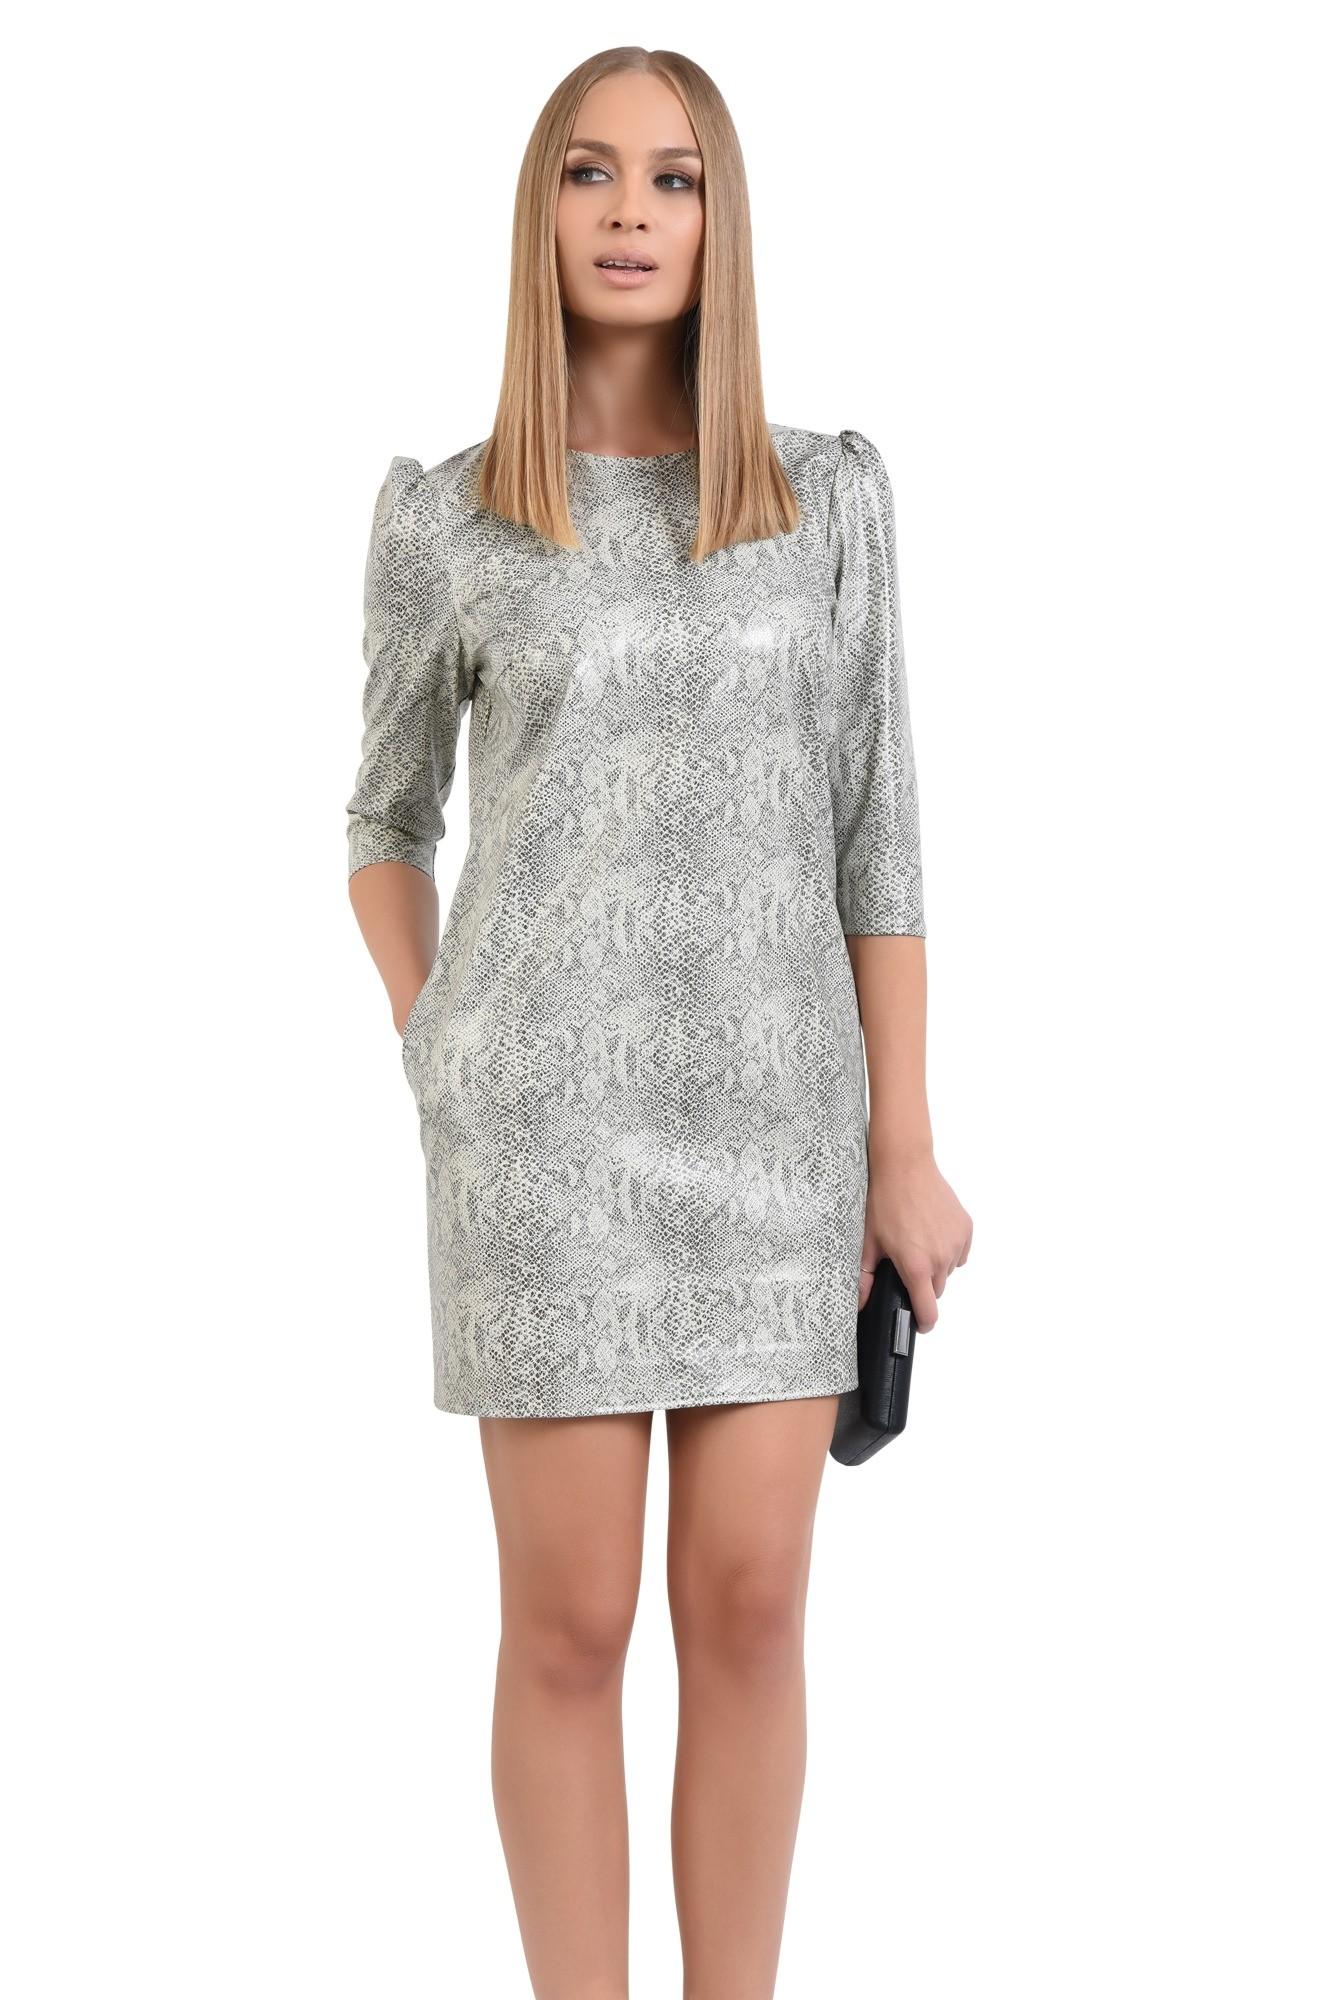 0 - rochie casual, piele eco, snakeskin, rochii online